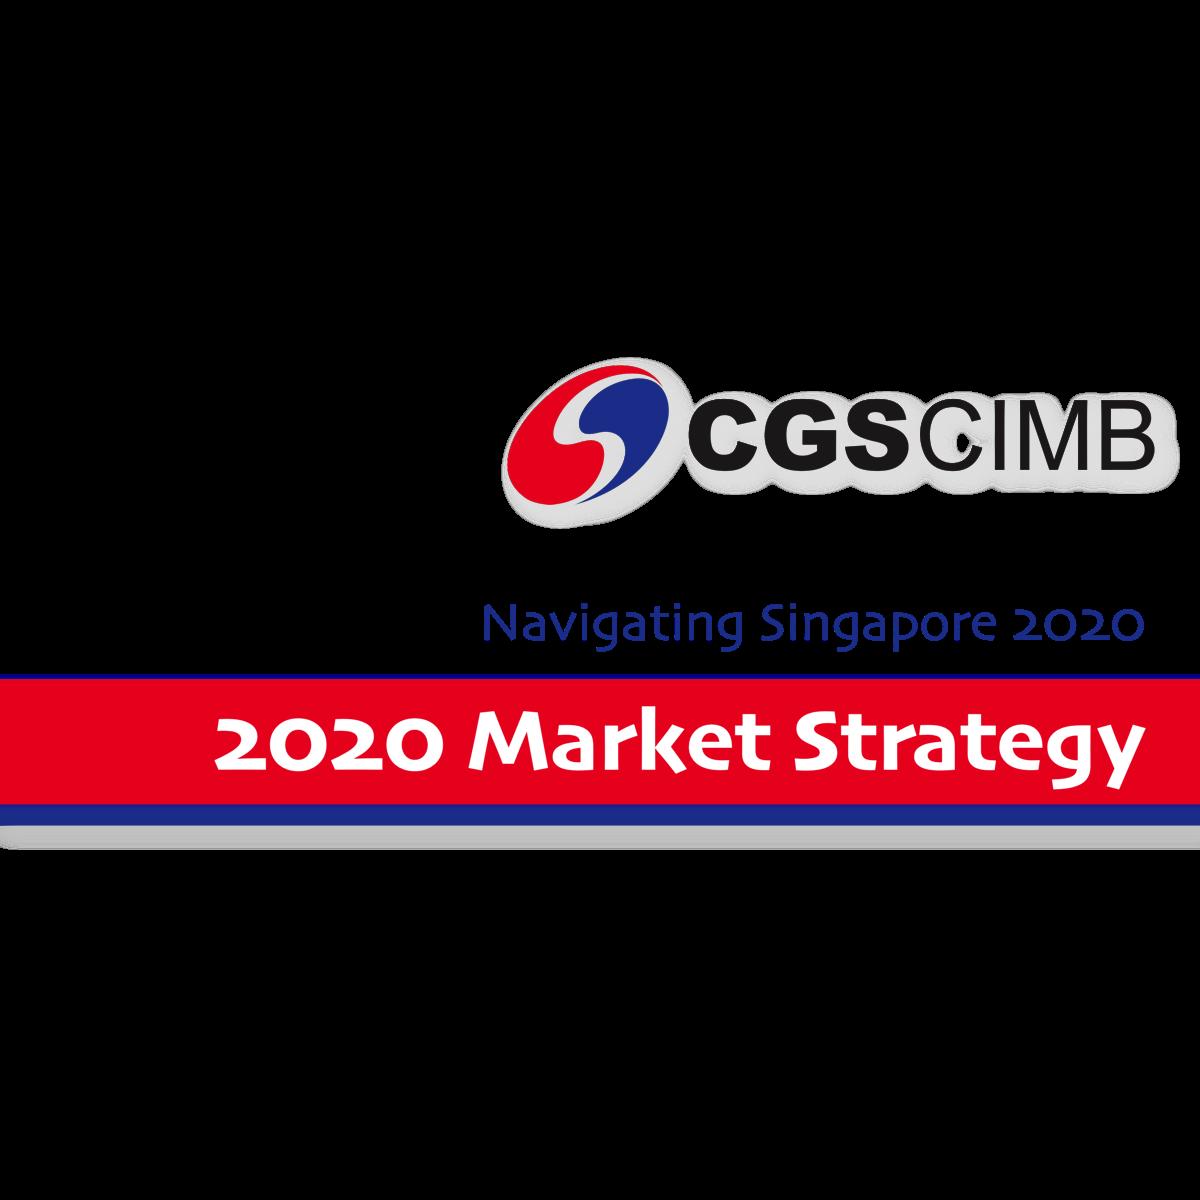 Navigating Singapore 2020 - CGS-CIMB Research | SGinvestors.io